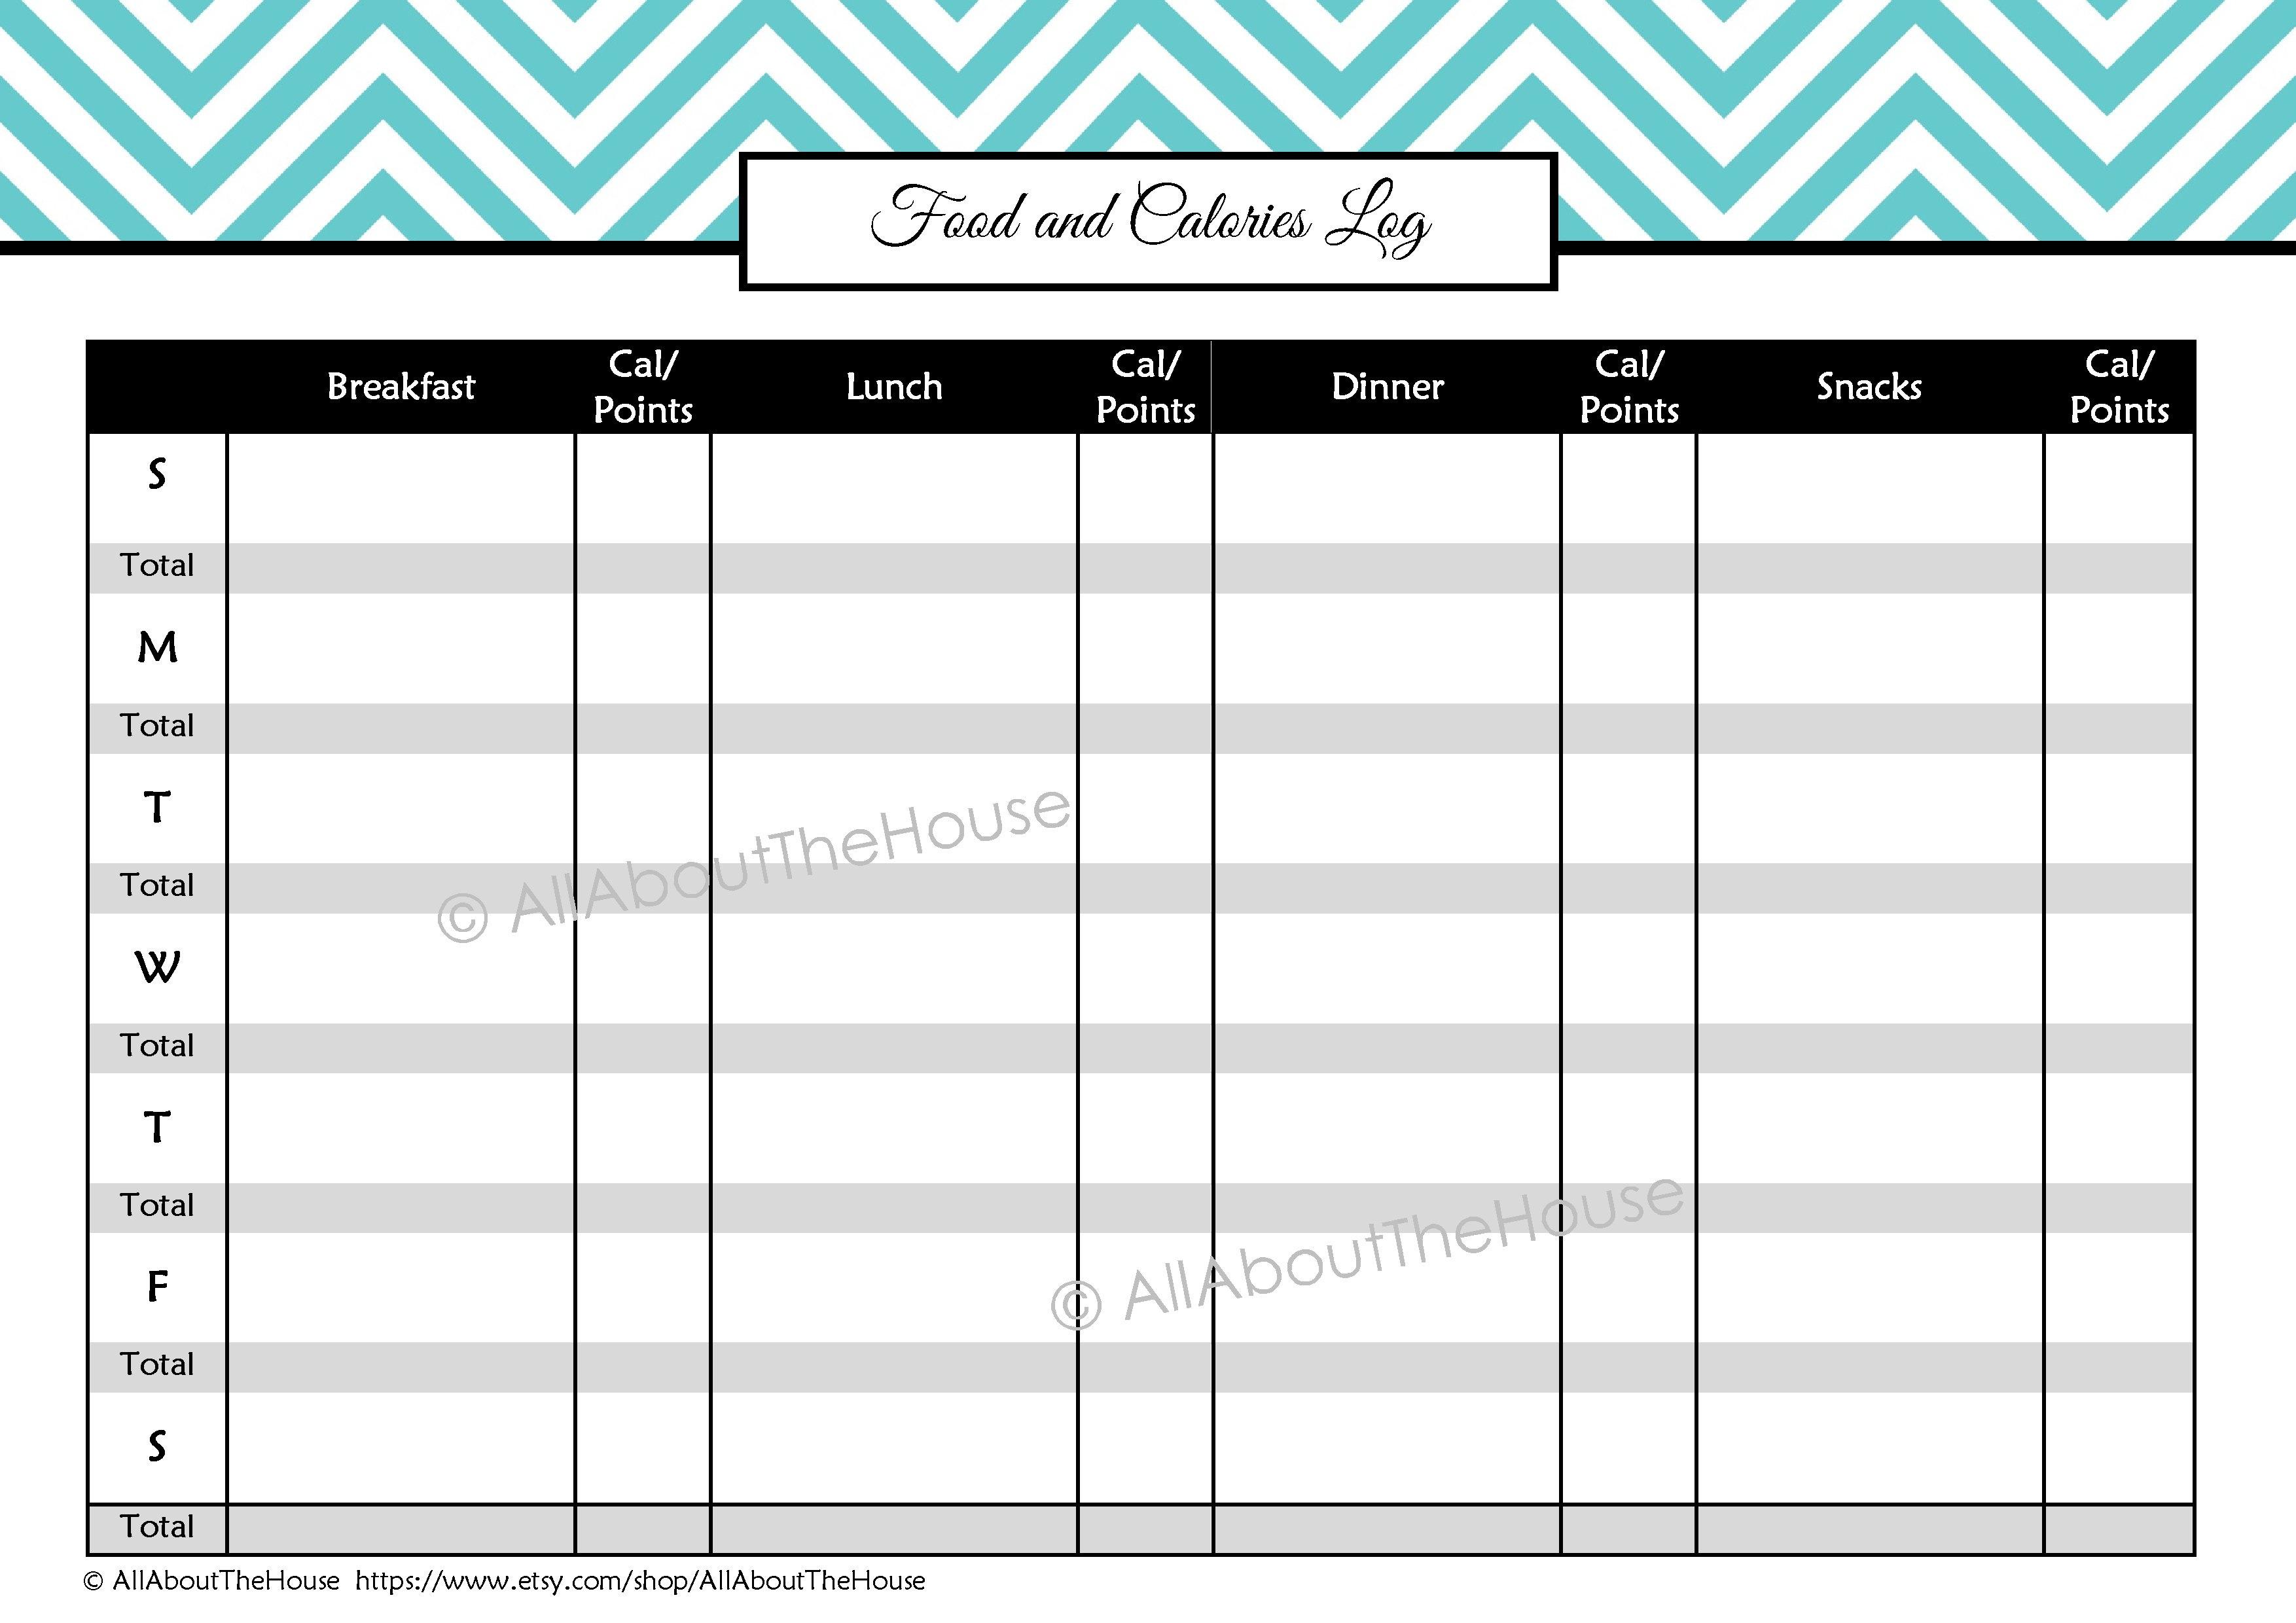 Daily Calorie Diary - Tutlin.psstech.co - Free Printable Calorie Counter Sheet